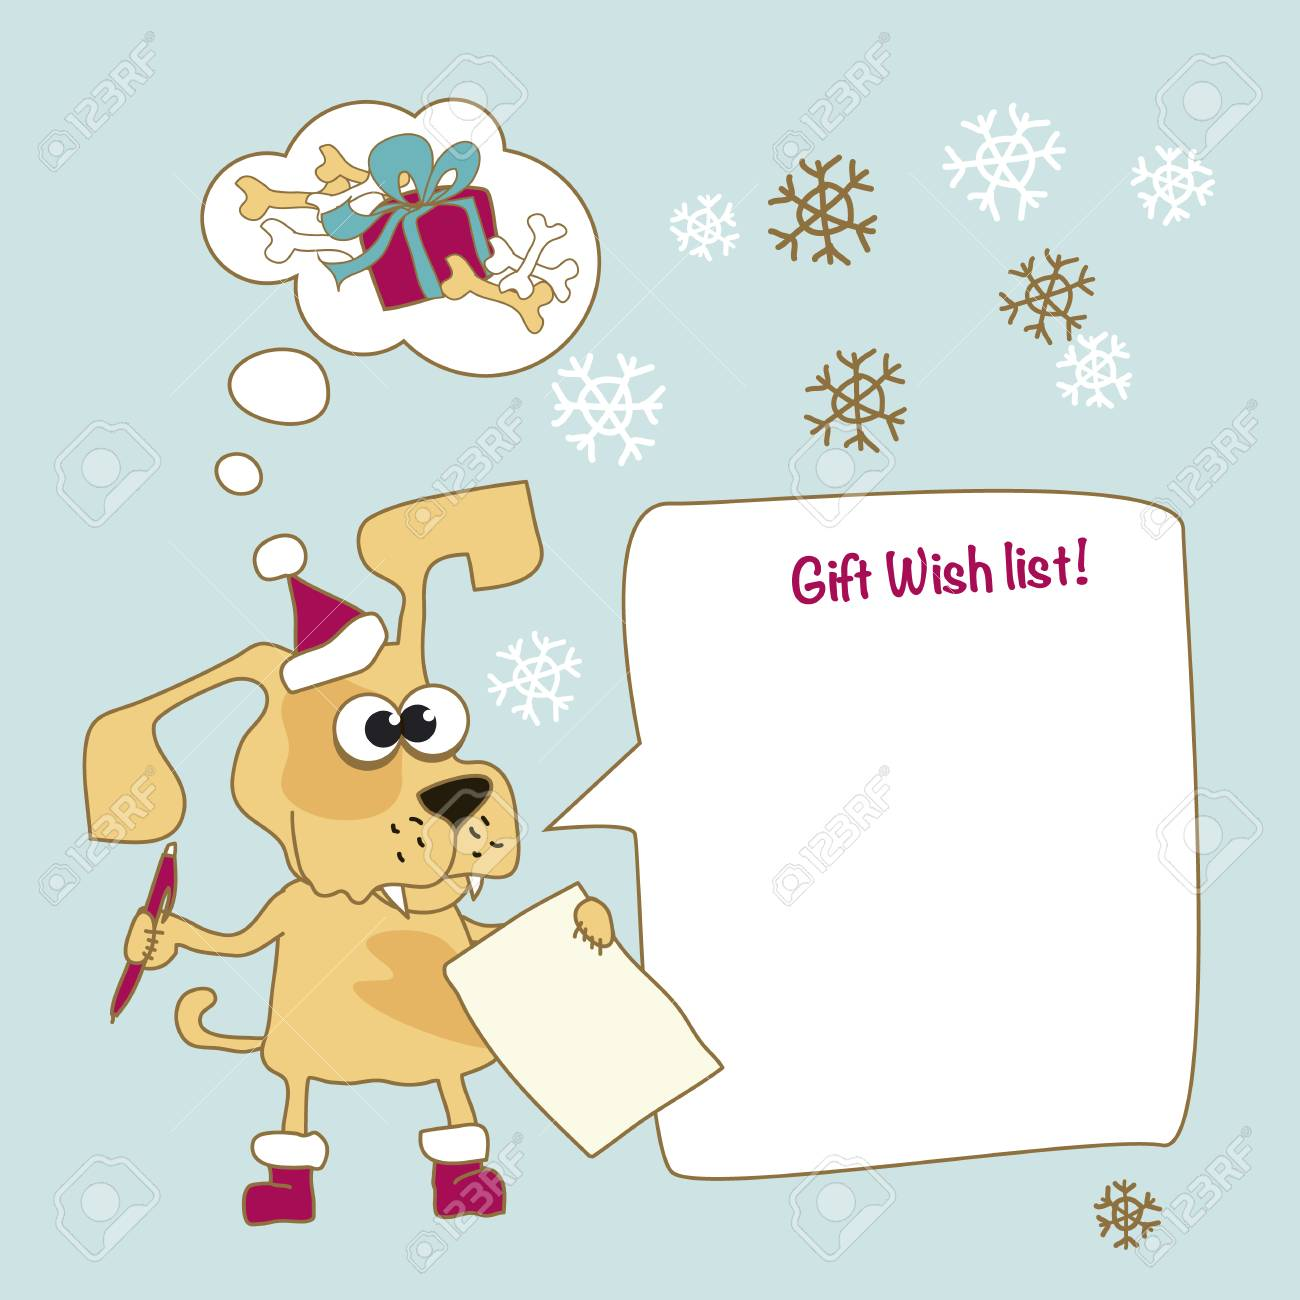 Cool Yellow Dog Mascot Cartoon. Funny Winter Xmas Animal In Santa ...